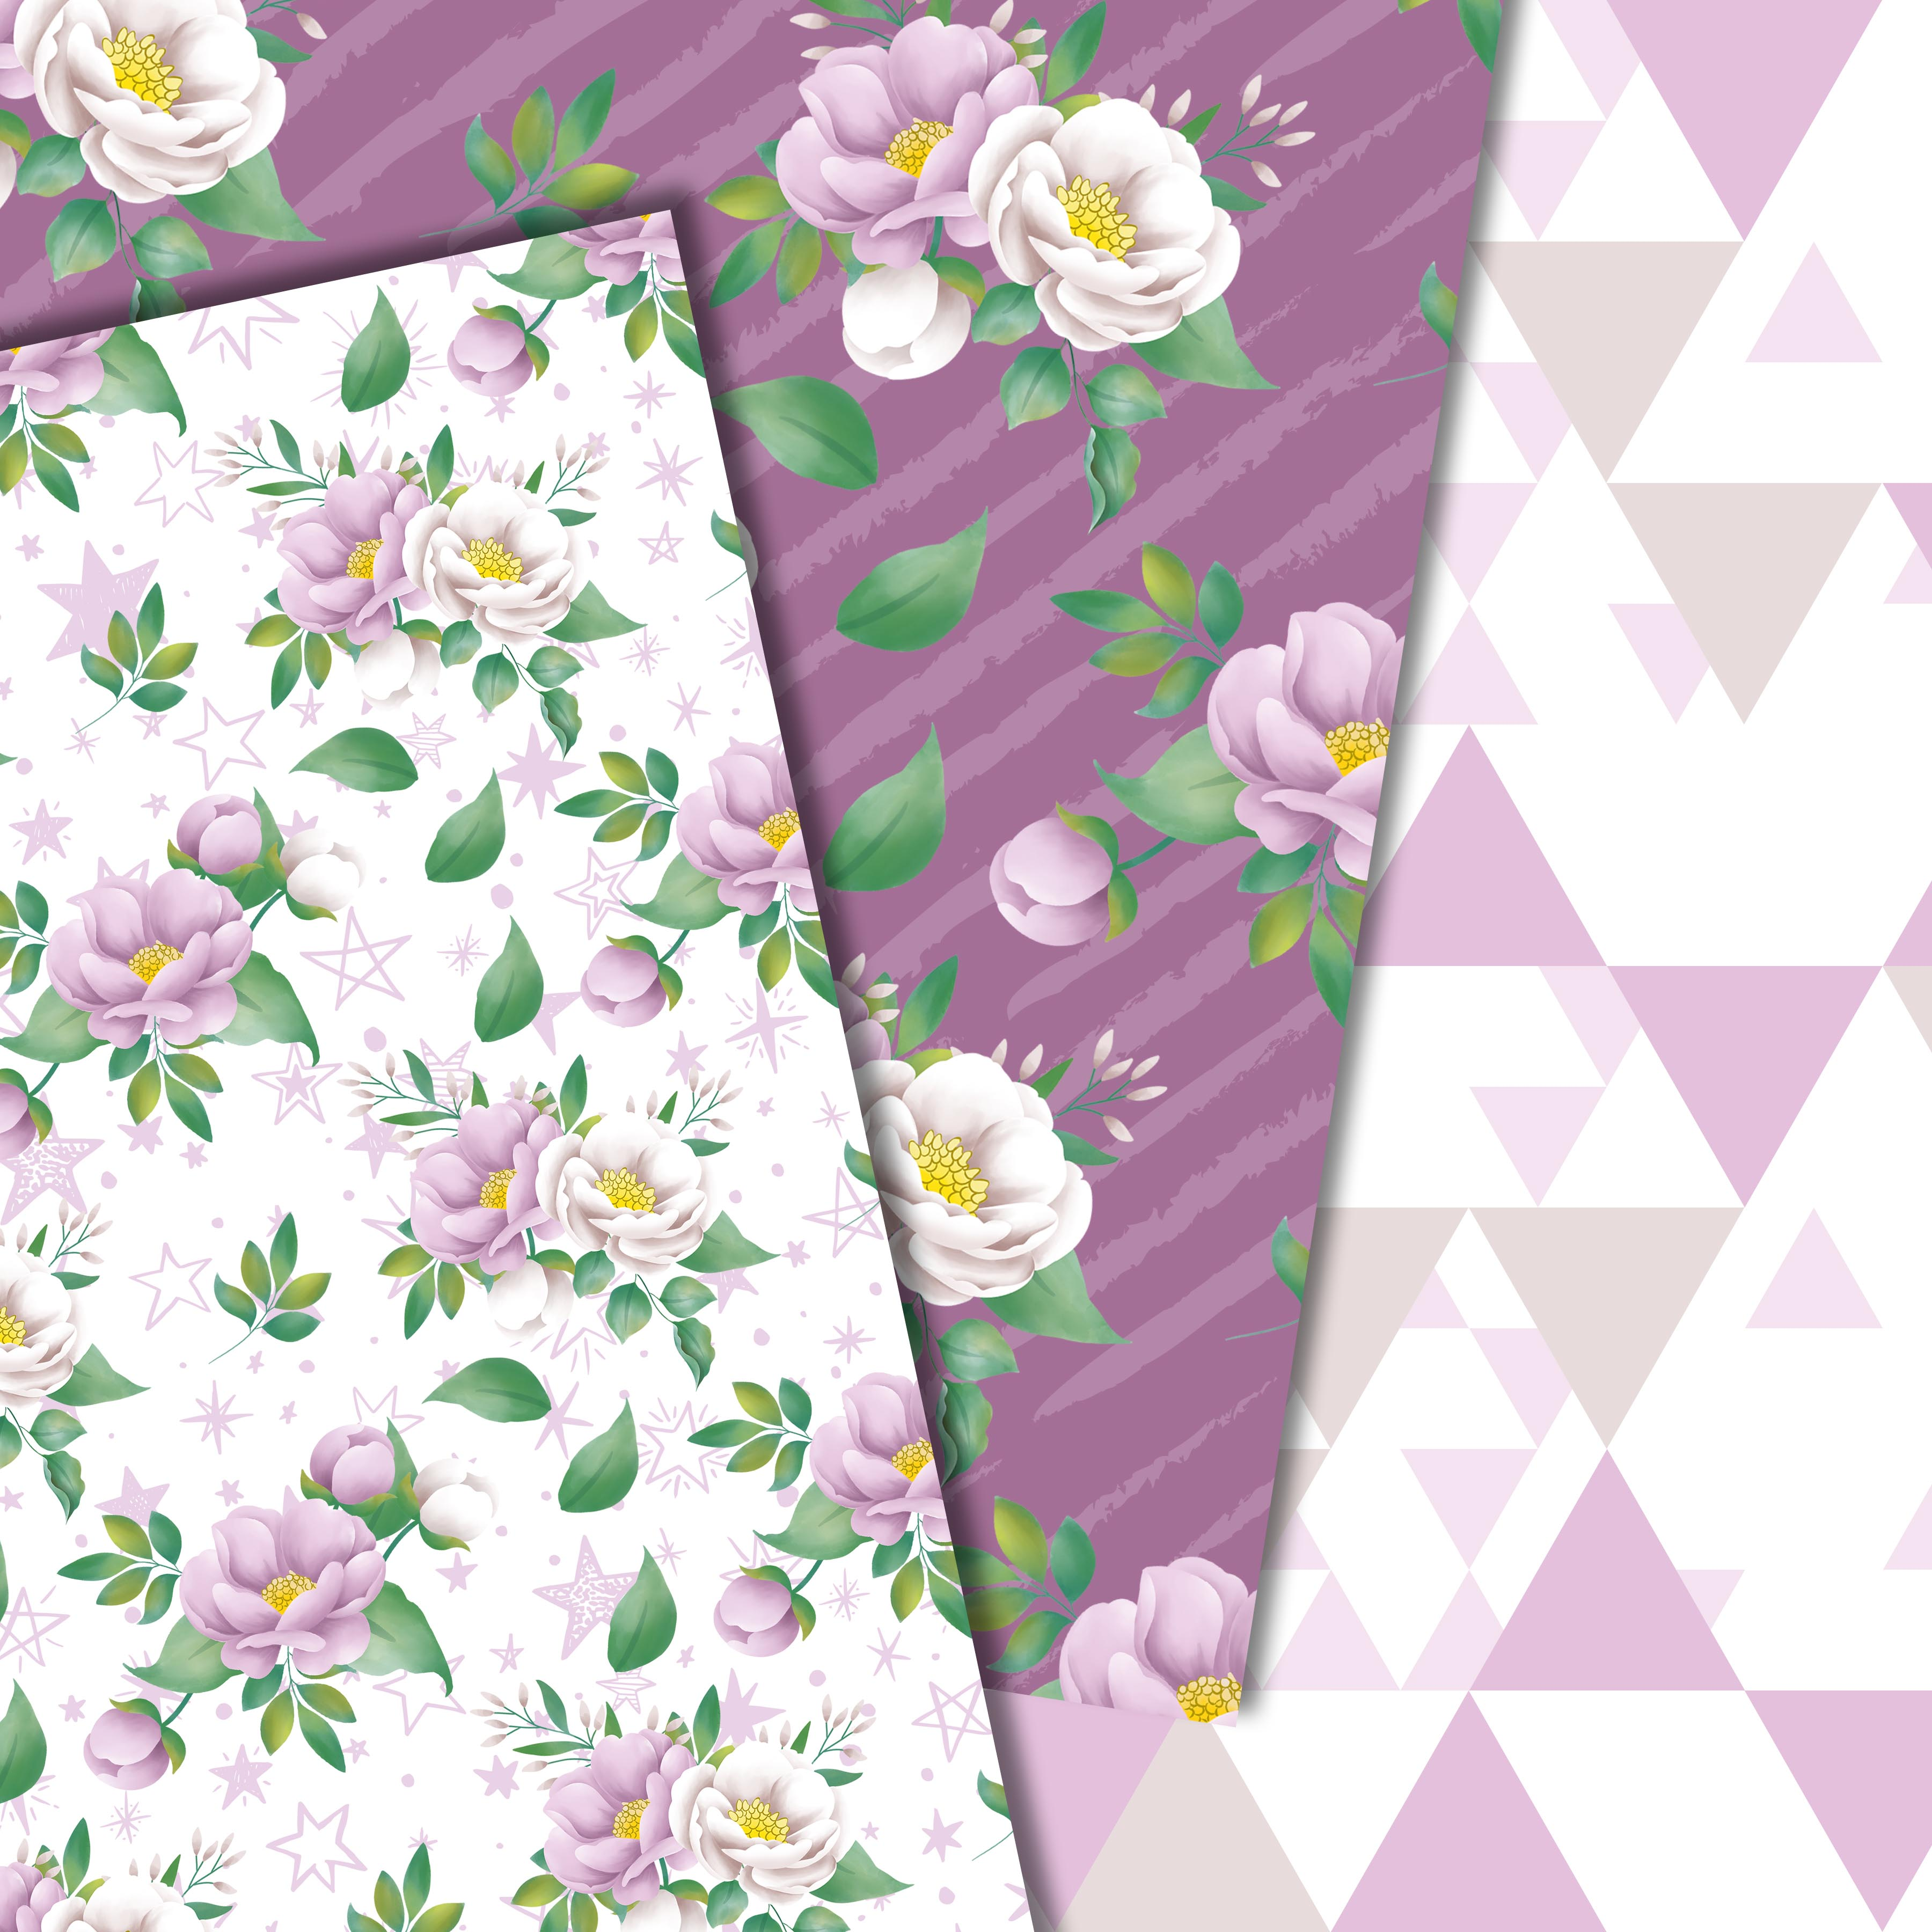 Purple flowers paper example image 2